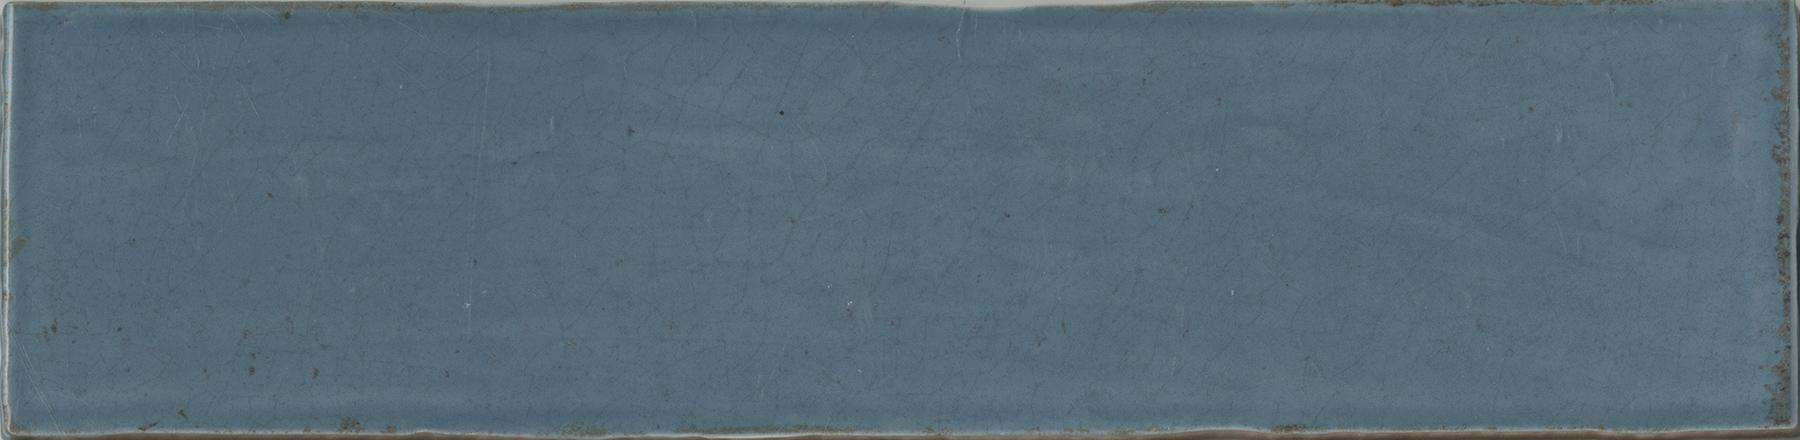 "CRACKLED BLUE STEEL 3""x12"""